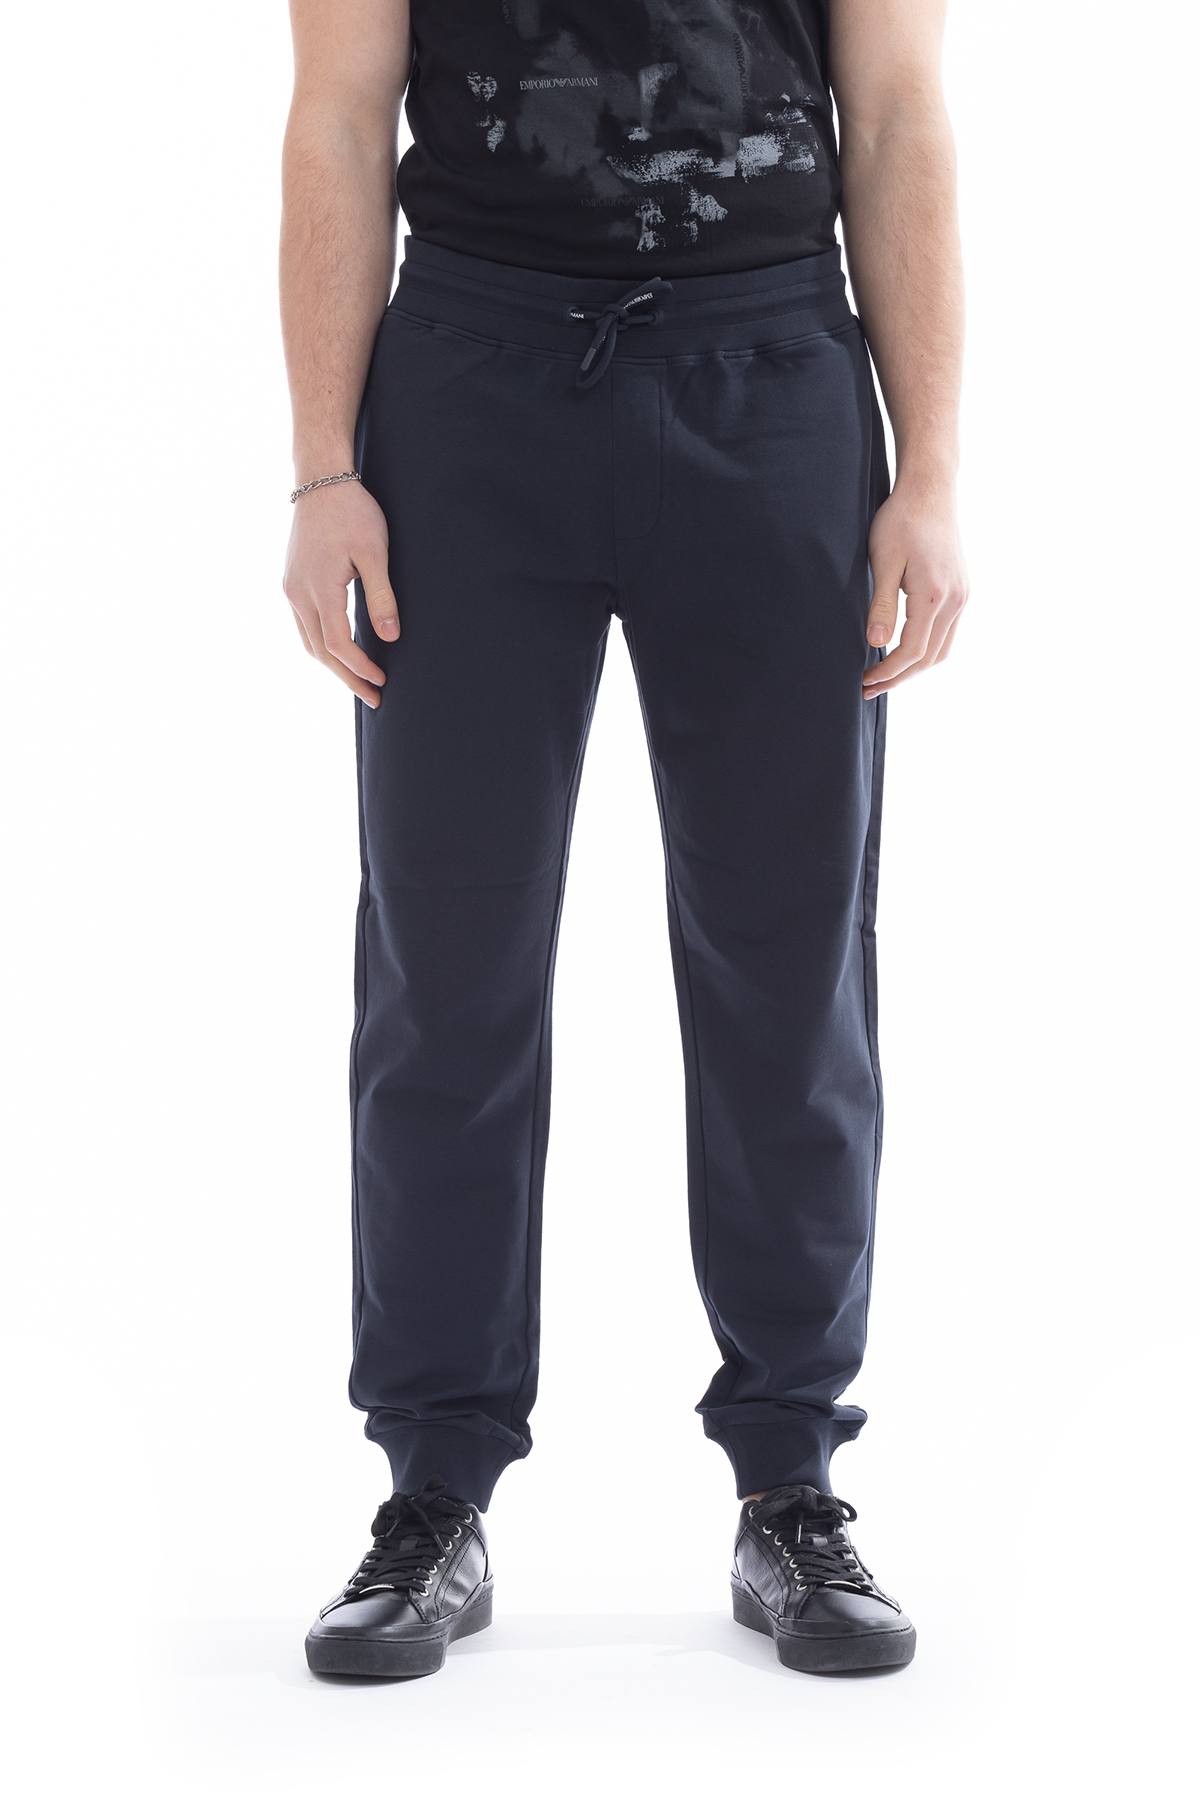 Emporio Armani Pamuklu Erkek Jogger Pantolon